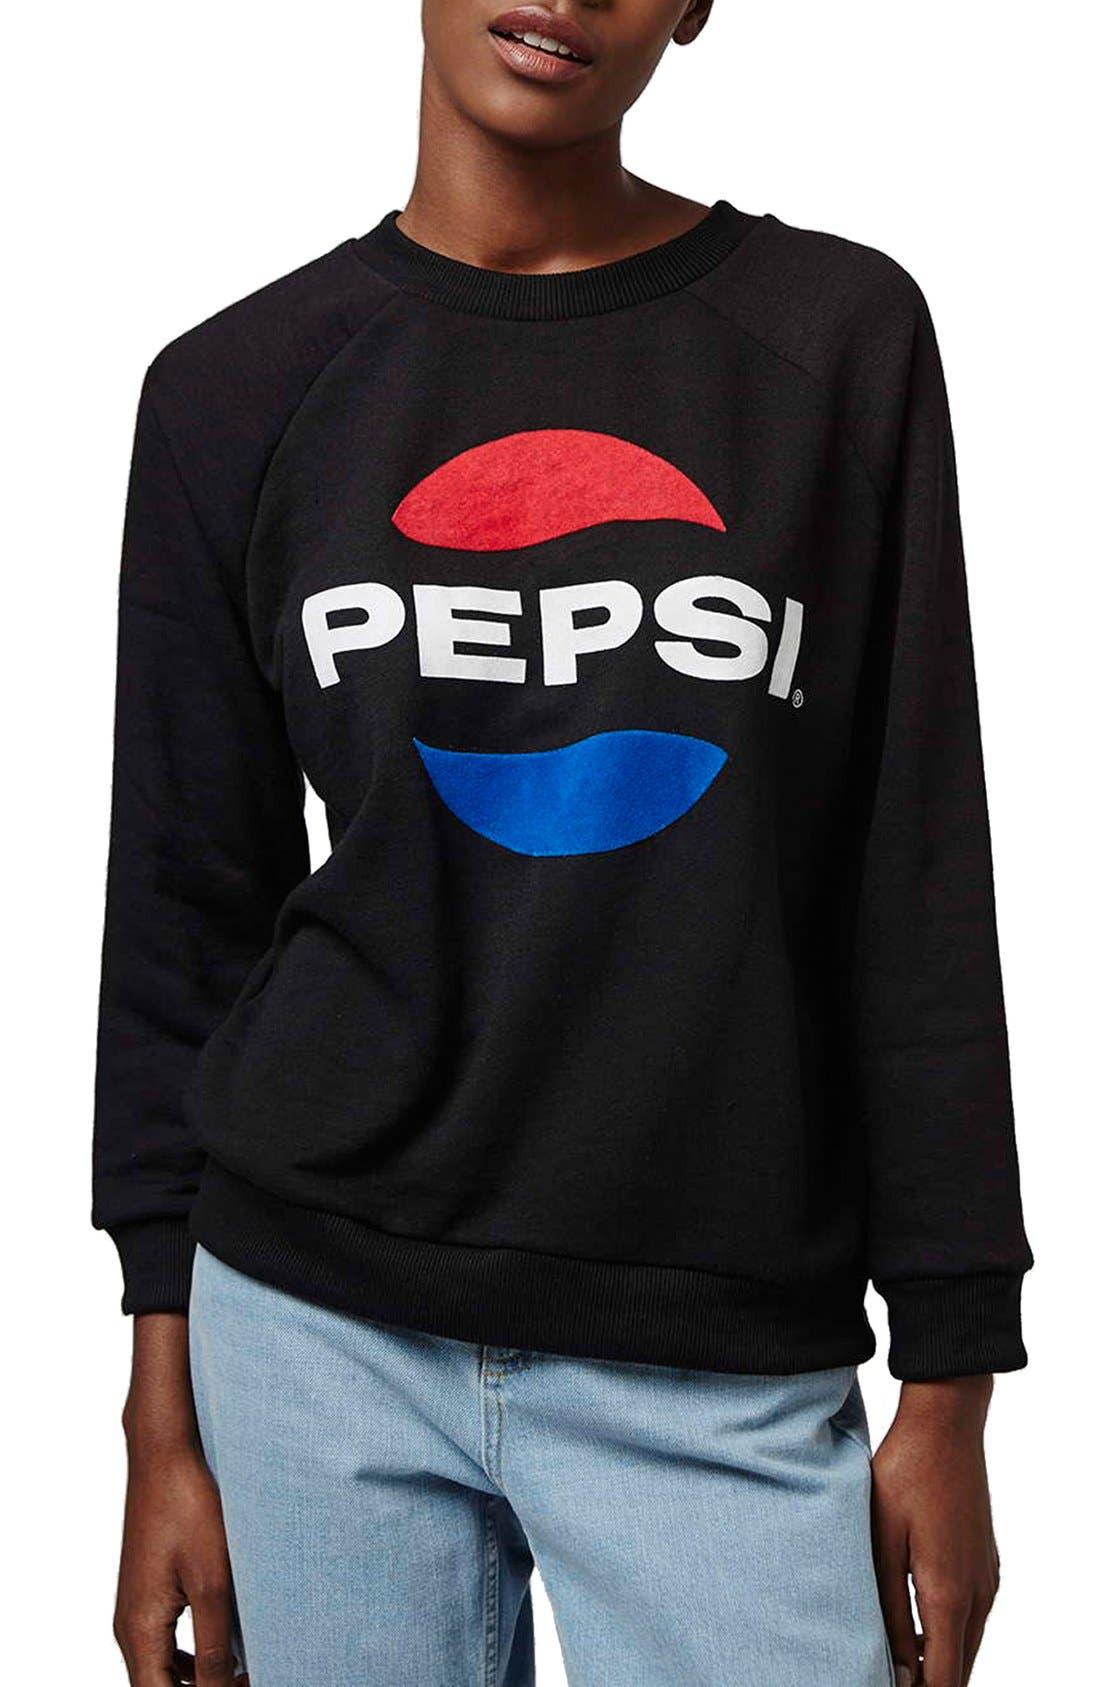 Main Image - Topshop Tee and Cake 'Pepsi' Sweatshirt (Petite)